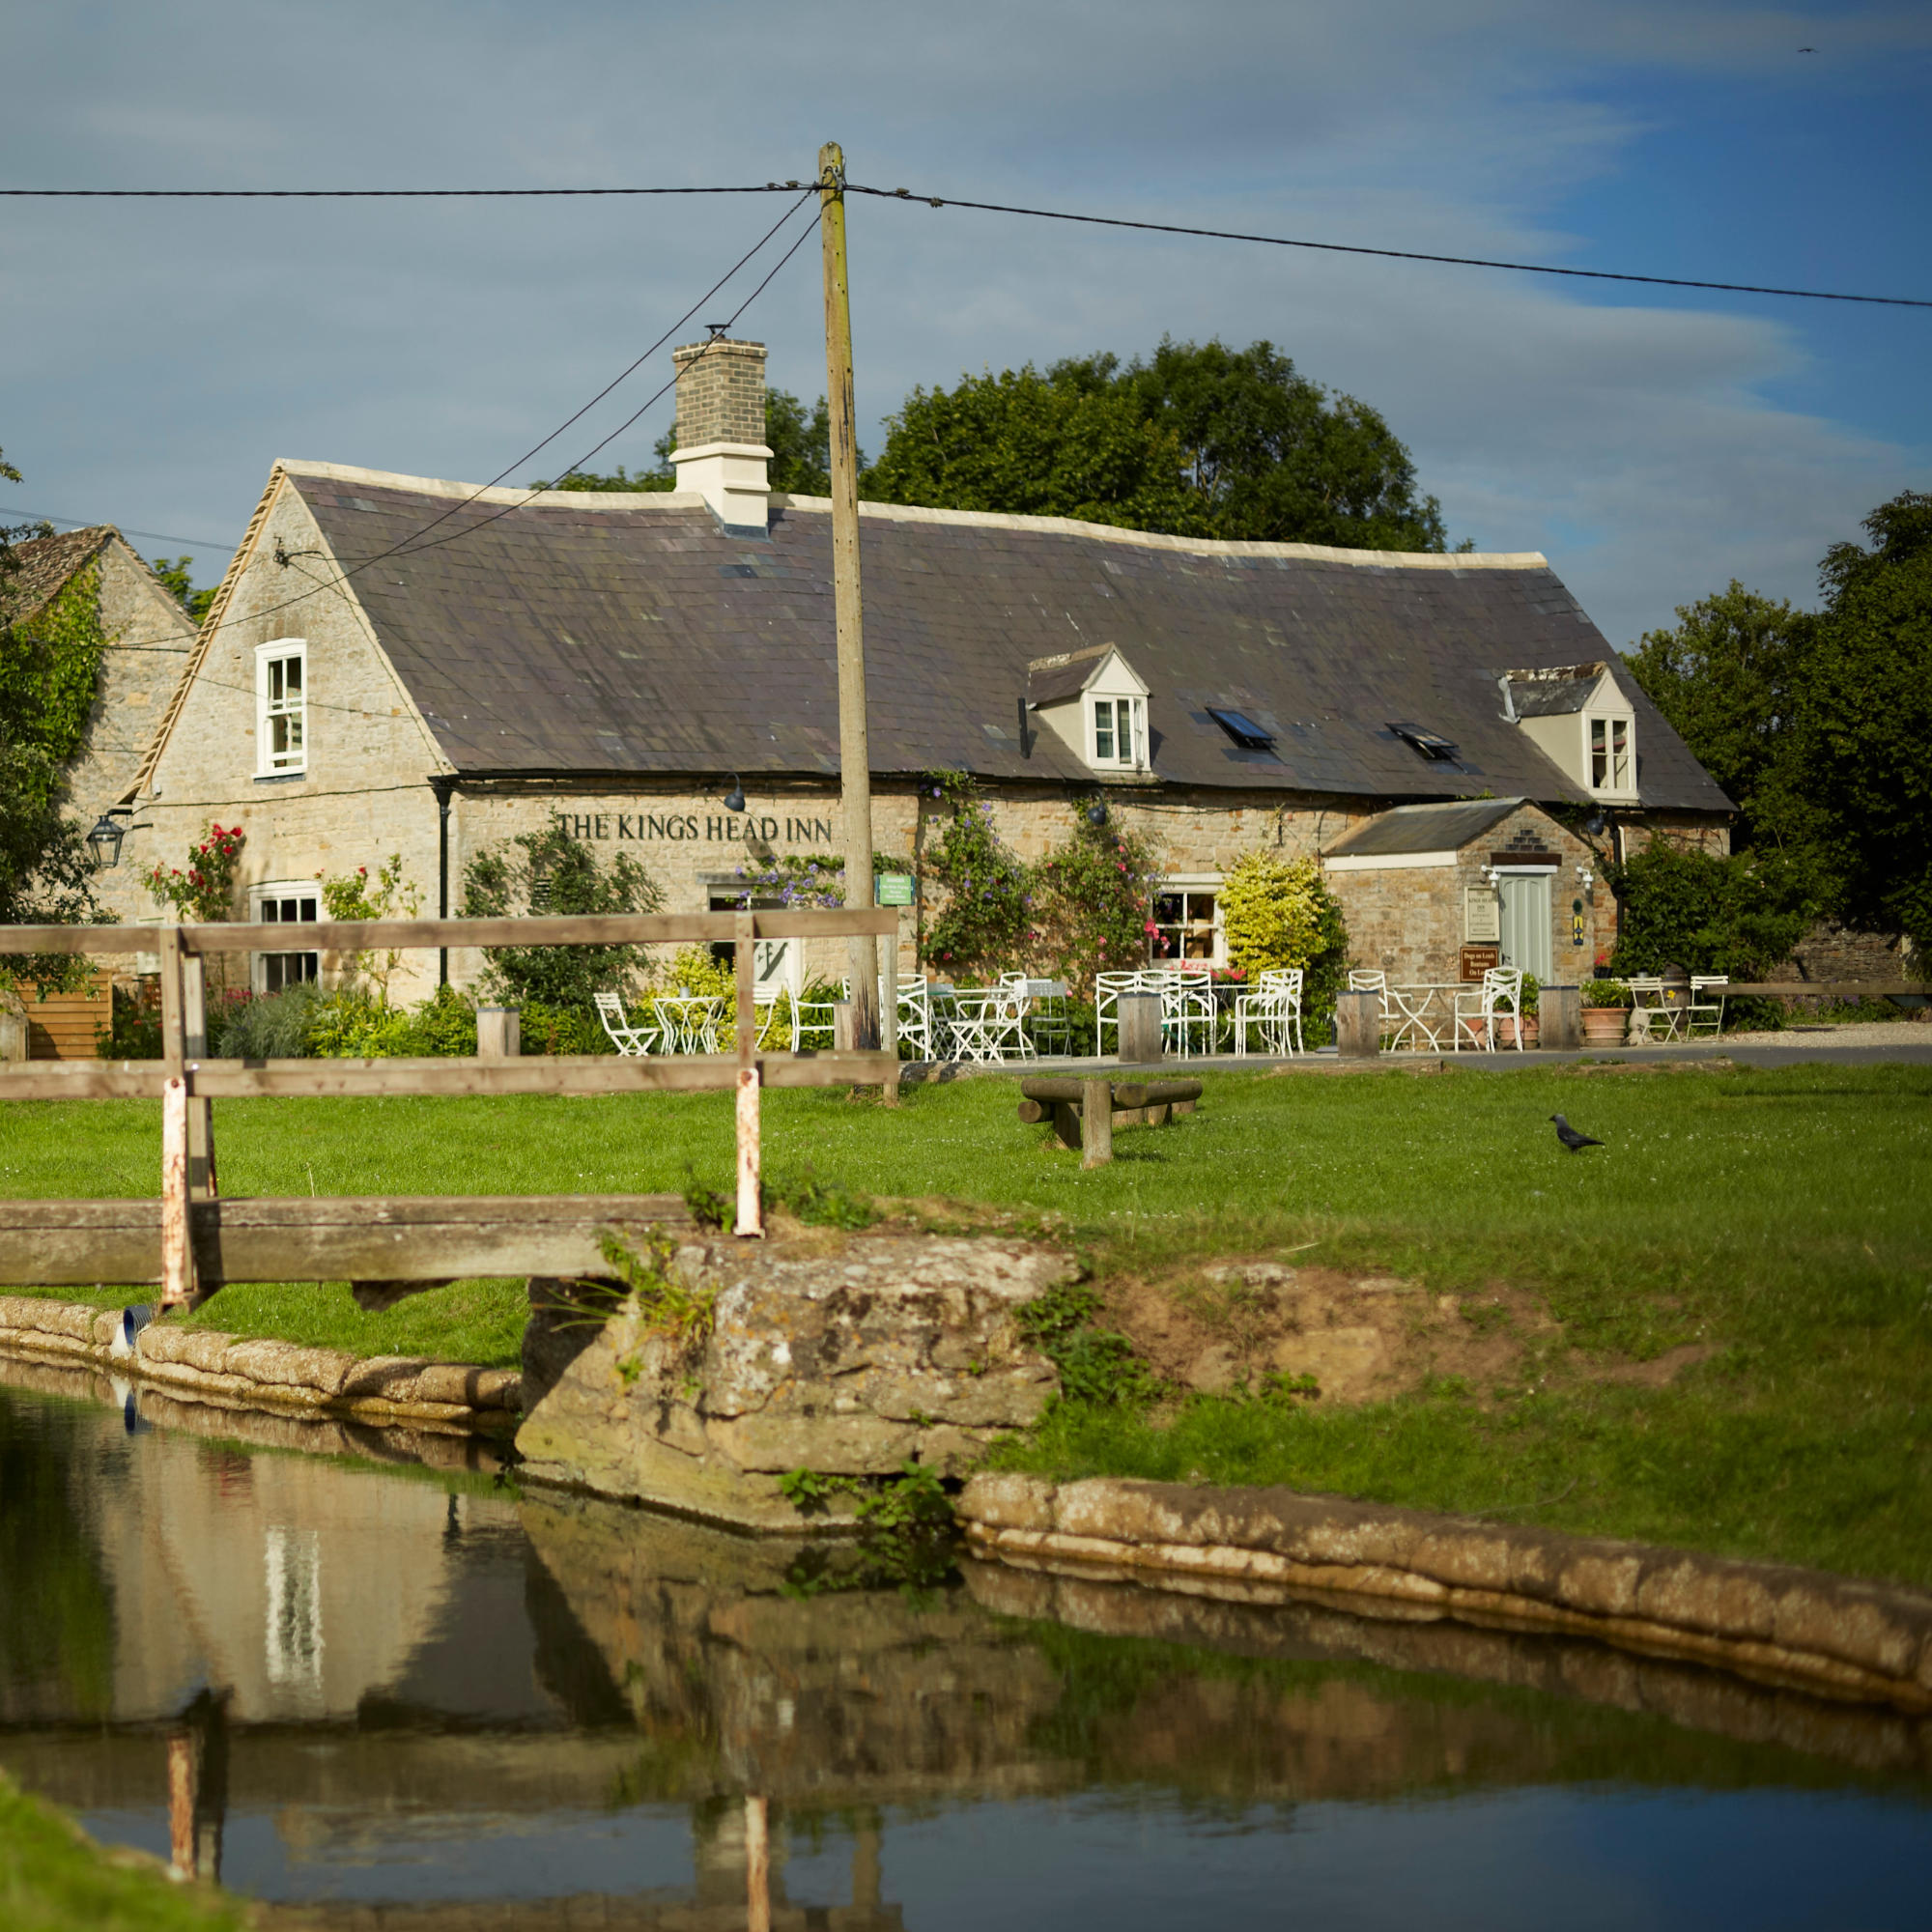 The King's Head Inn overlooks Bledinton village green in The Cotswolds